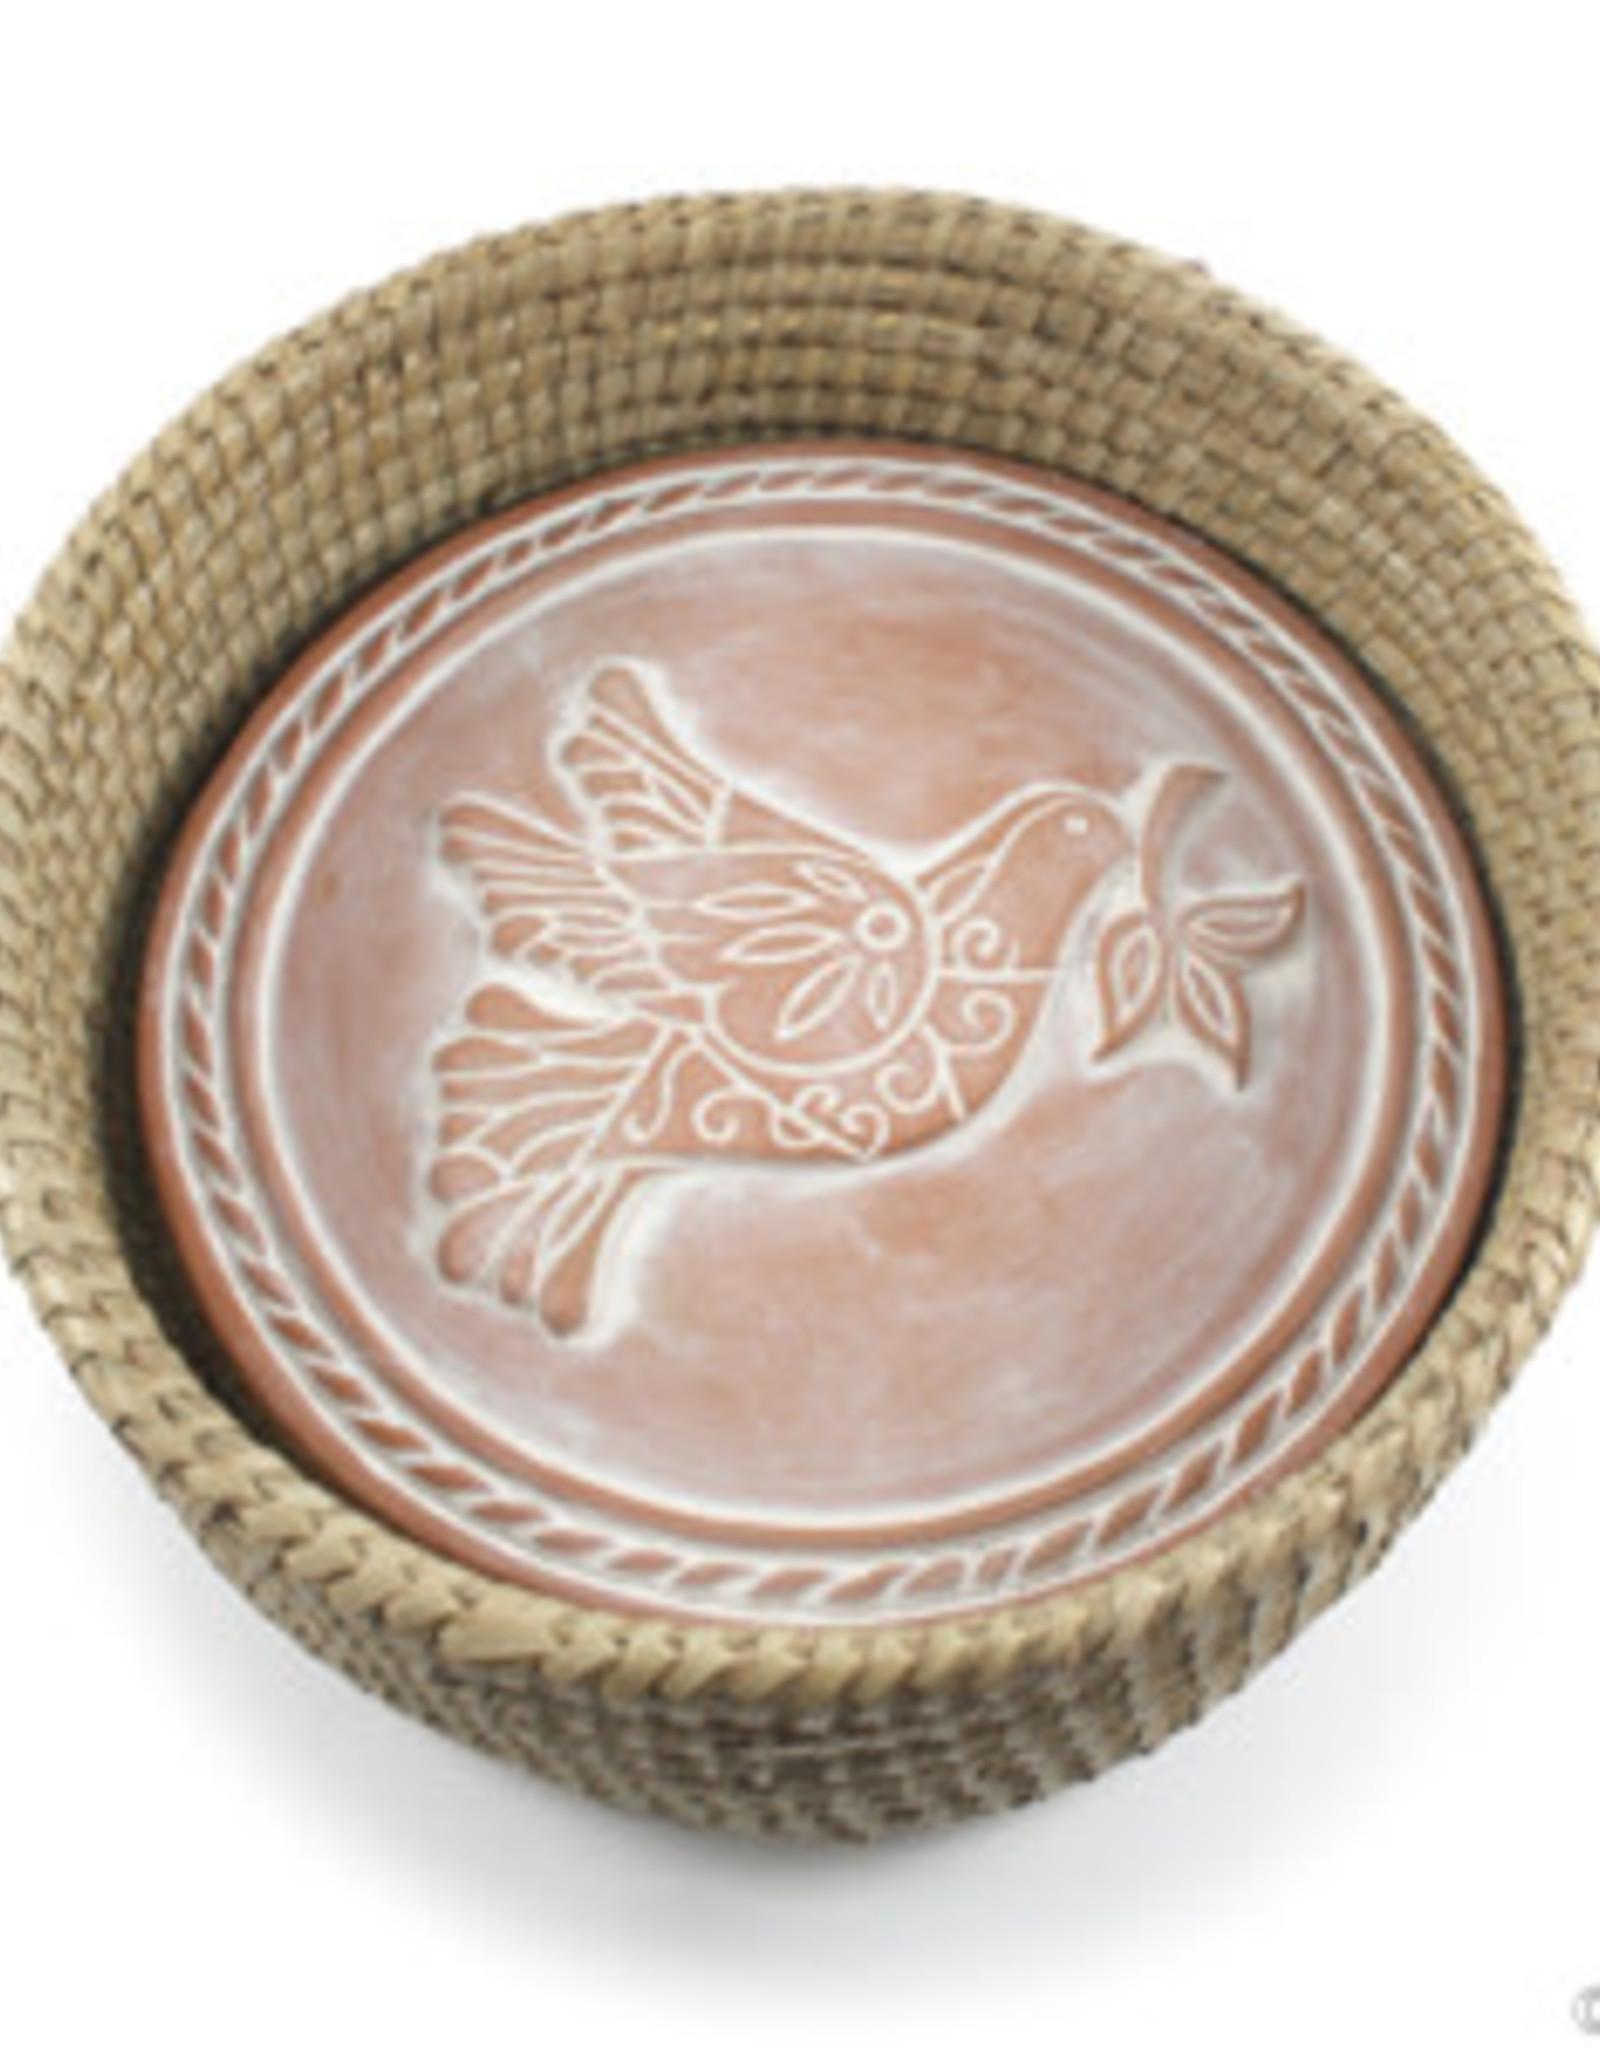 Bangladesh, Peace Dove Breadwarmer